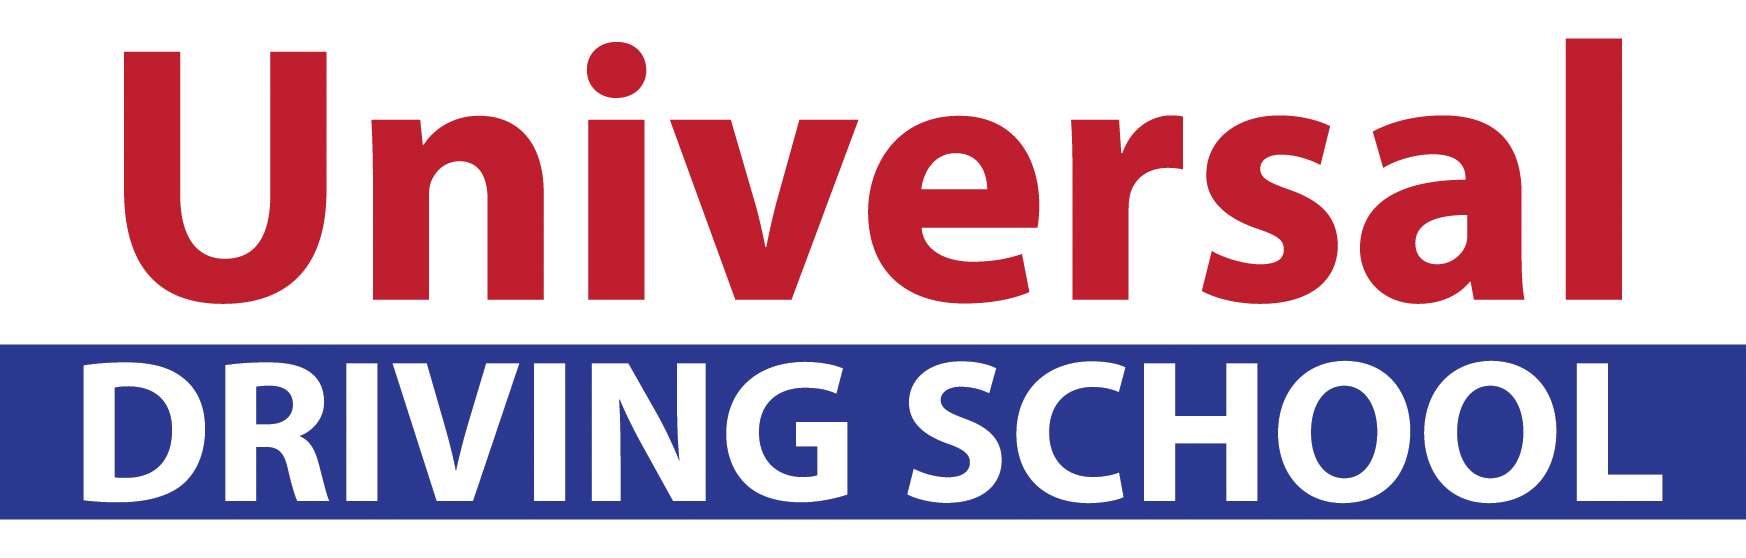 Universal Driving School Ottawa Inc.